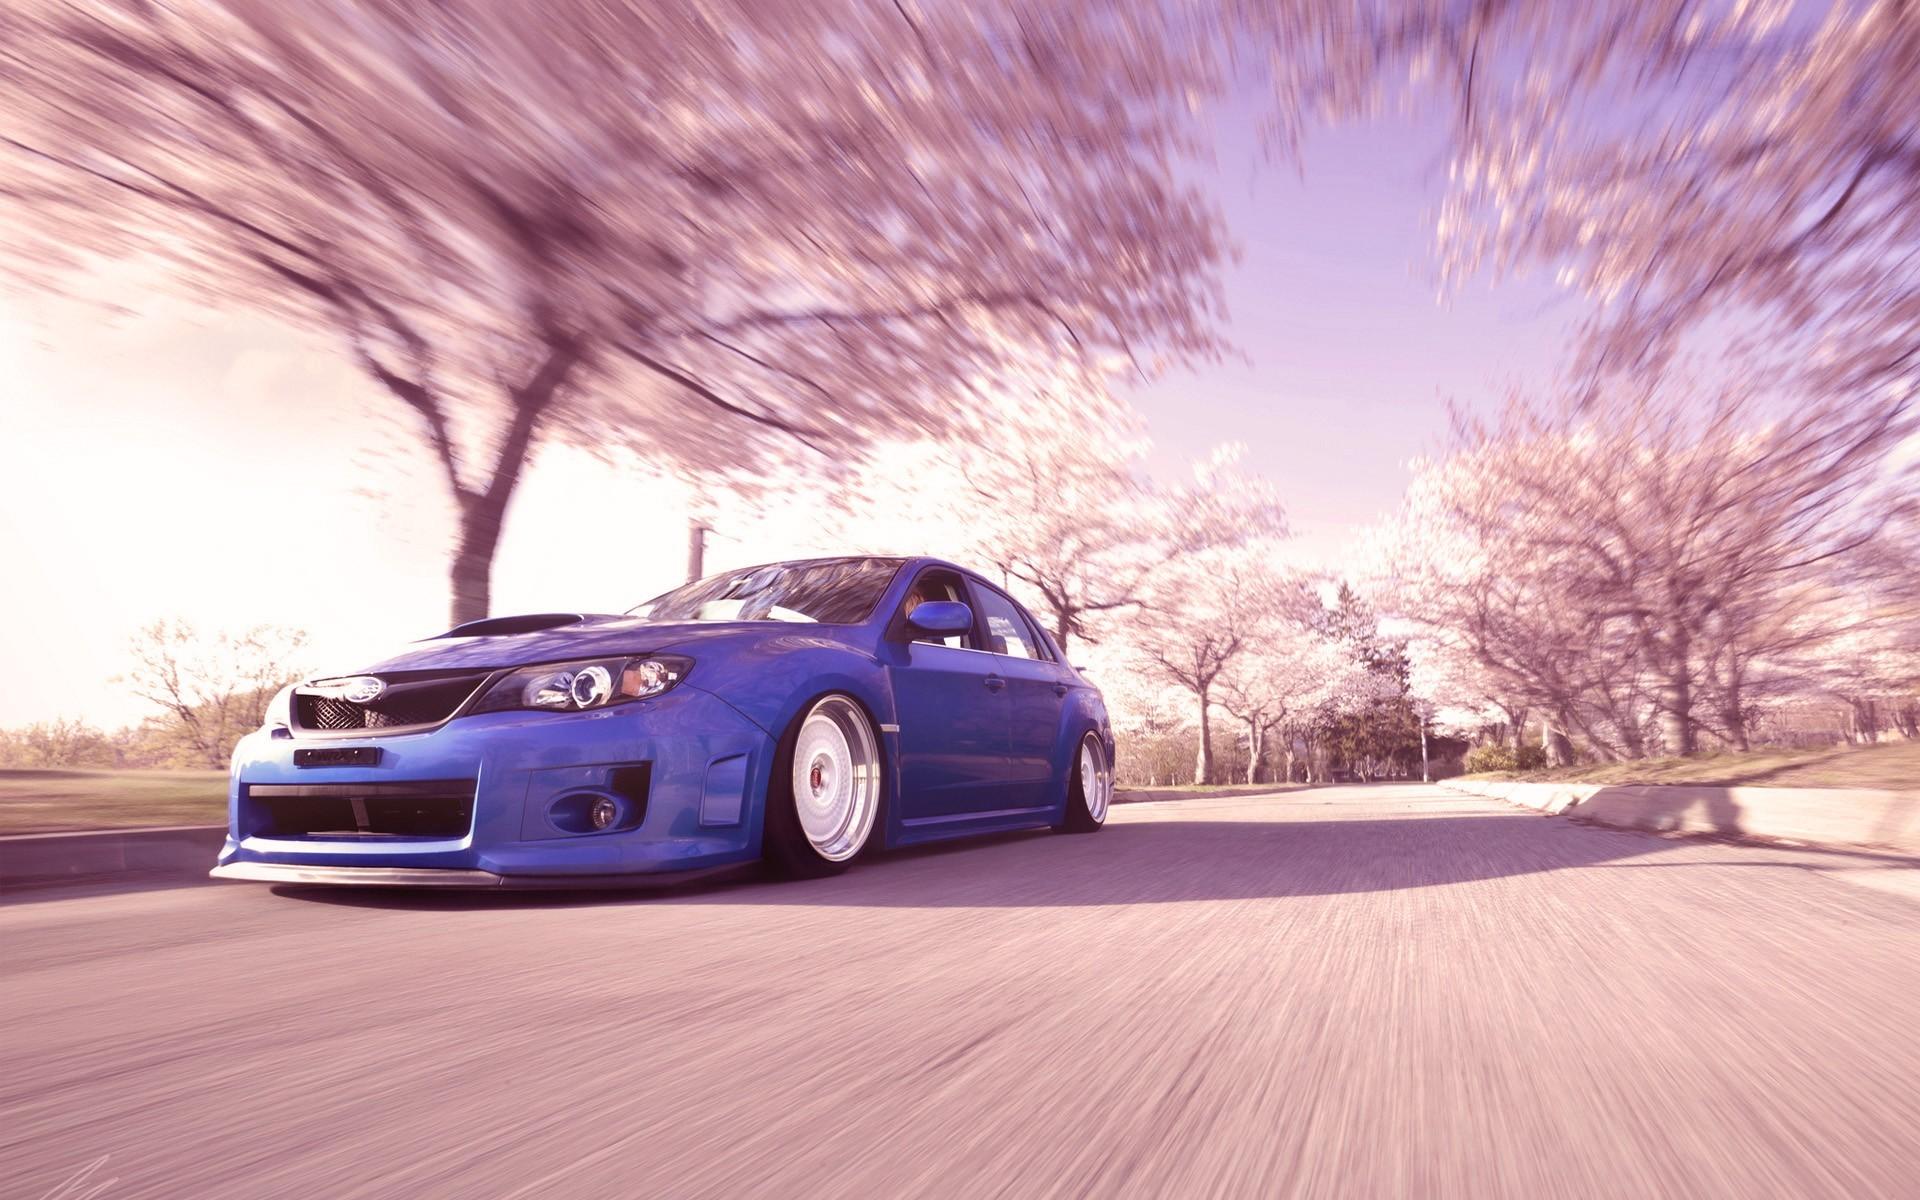 Epic Car Wallpapers: Subaru Wrx Wallpaper HD (68+ Images